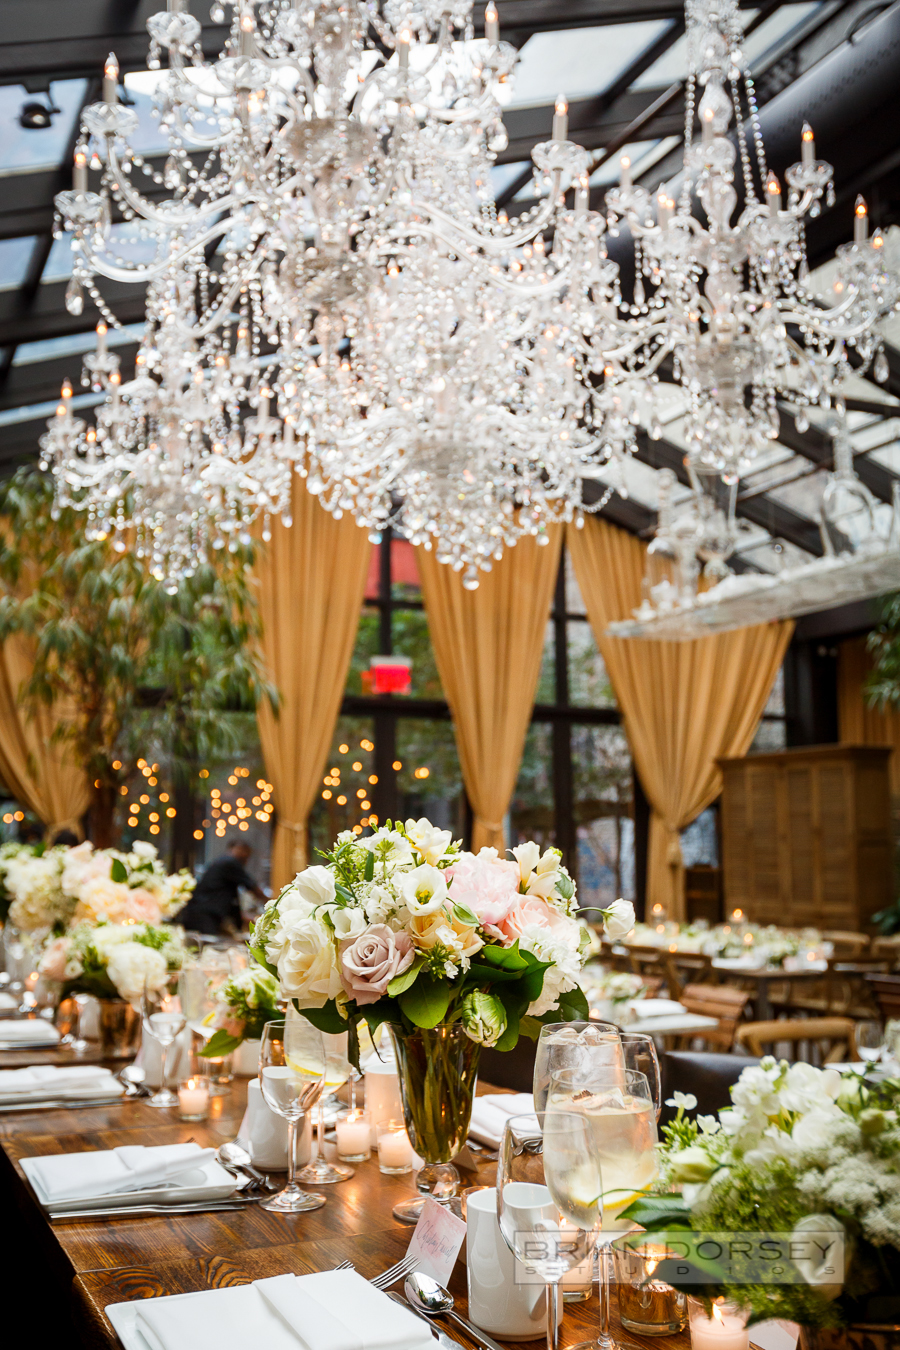 isola nomo soho hotel wedding brian dorsey studios ang weddings and events-27.jpg